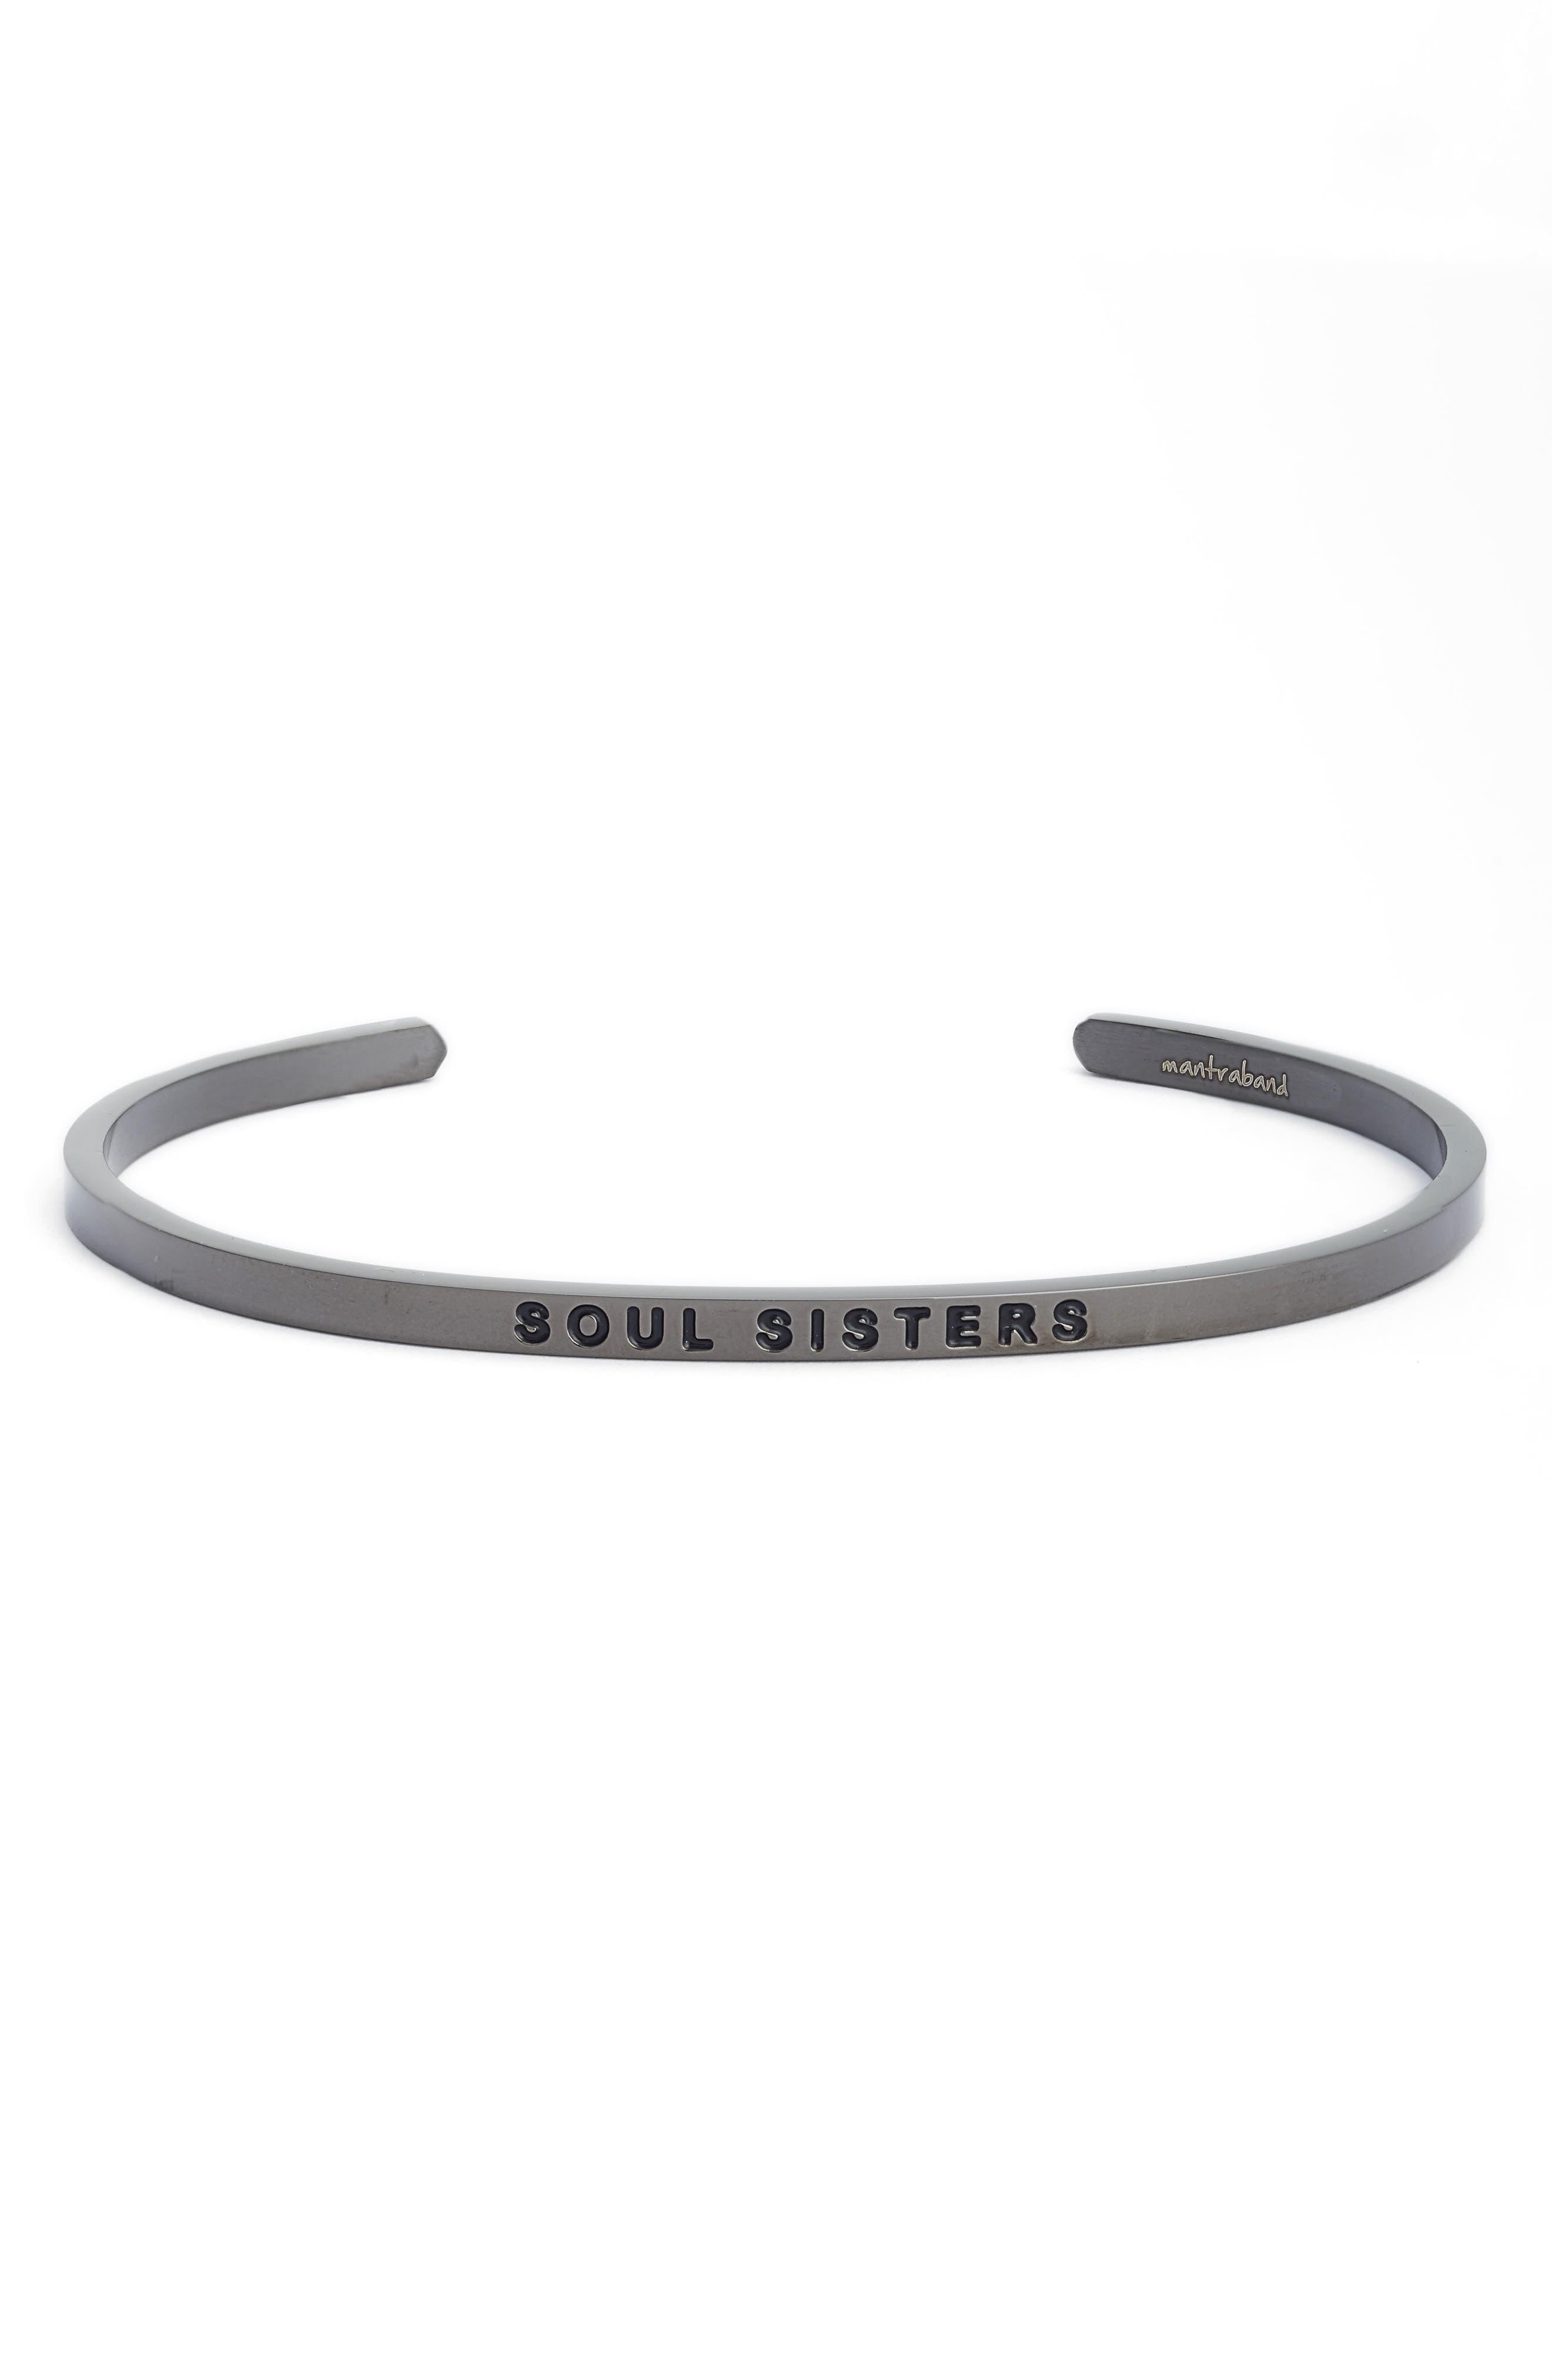 MantraBand® Soul Sisters Cuff Bracelet